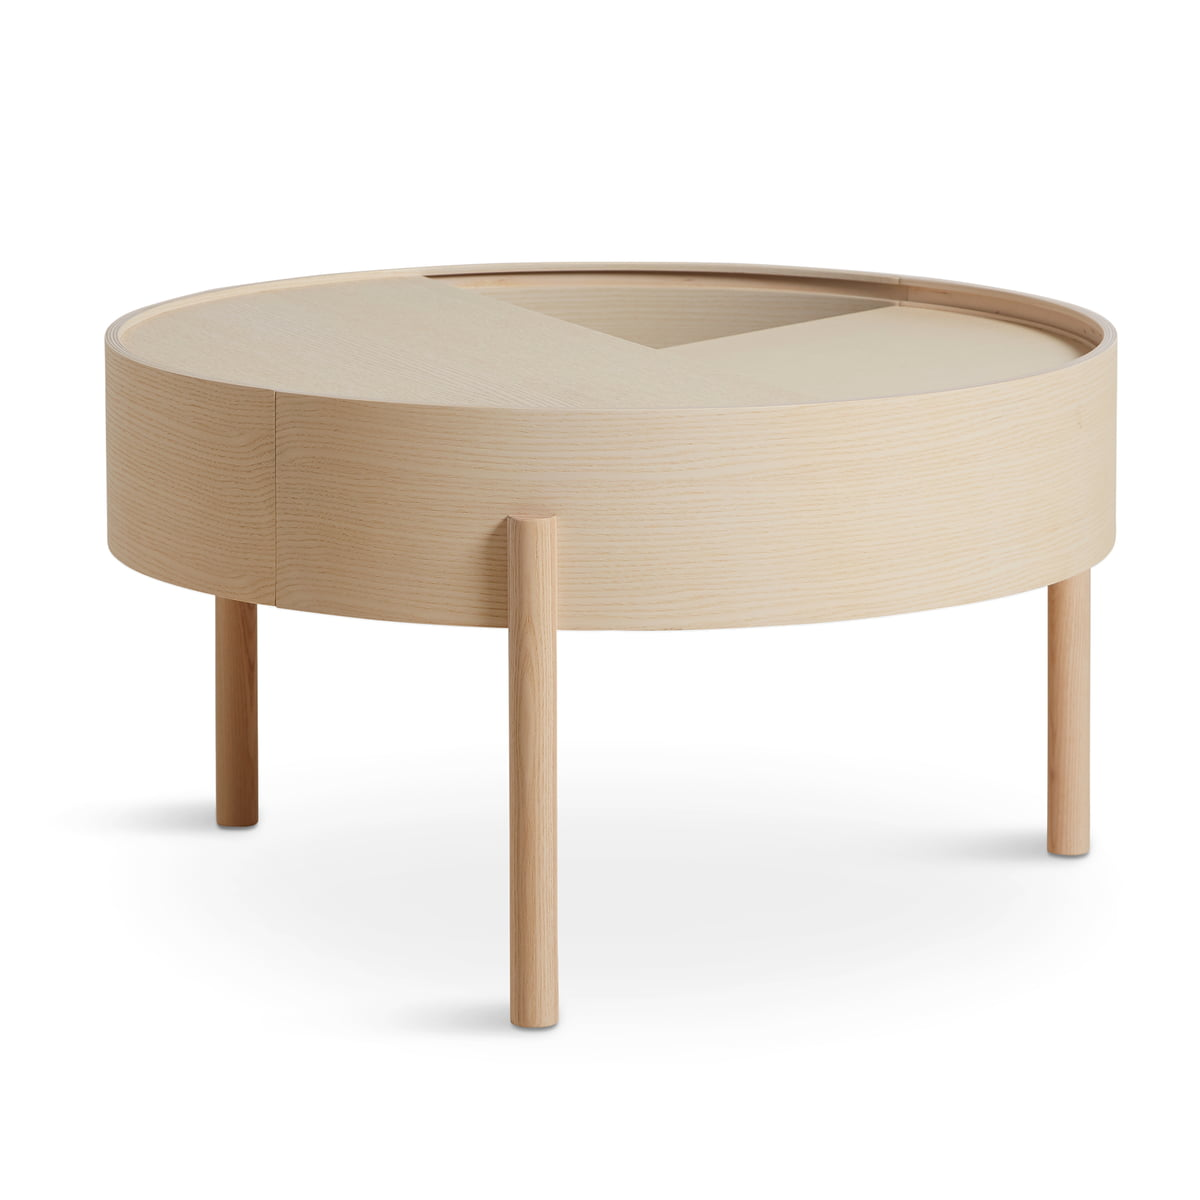 Marvelous Woud Arc Side Table O 42 Cm H 45 Cm Ash White Pigmented Uwap Interior Chair Design Uwaporg